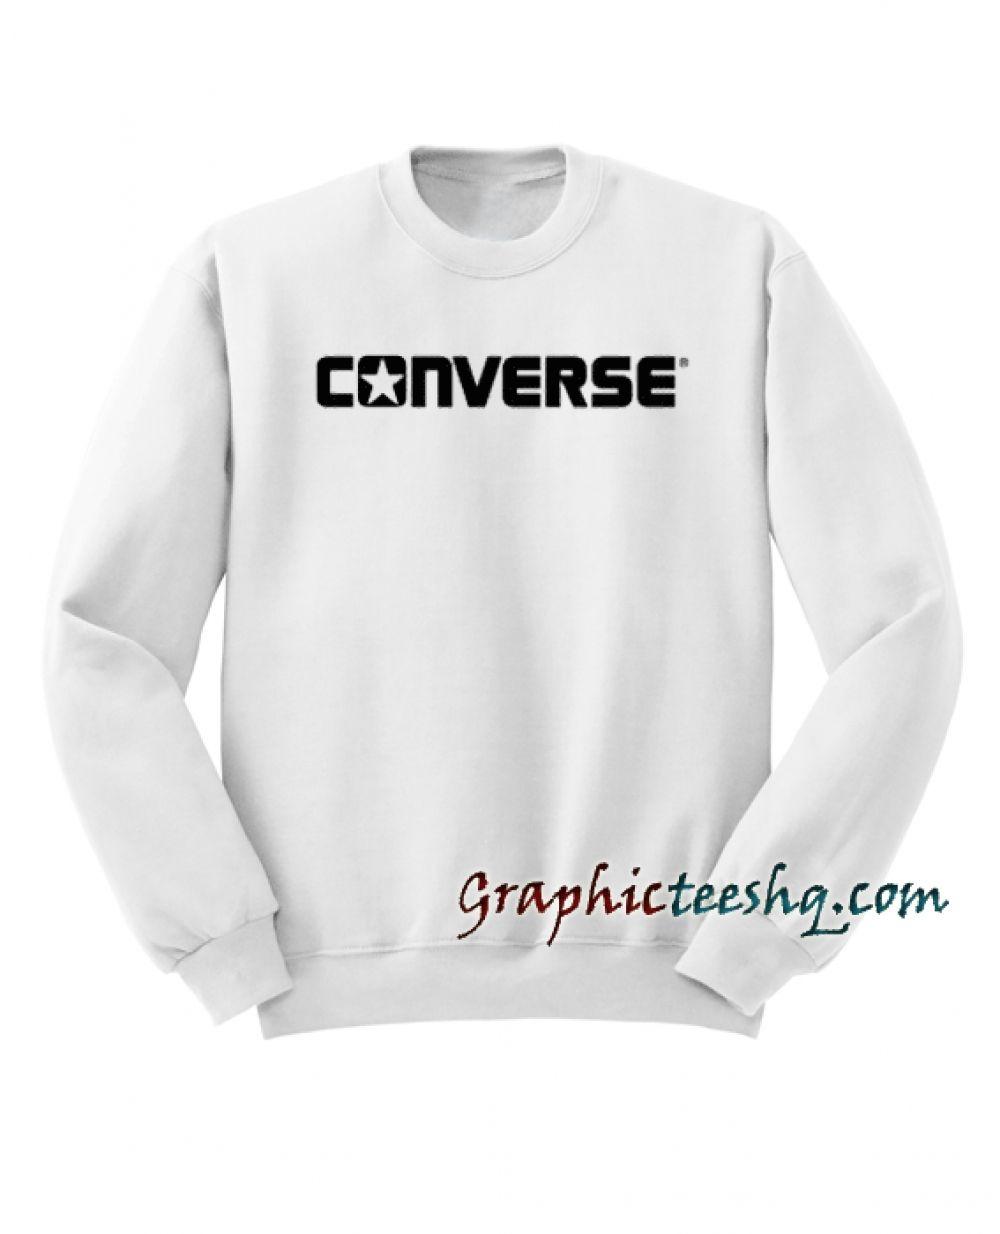 converse shirt price